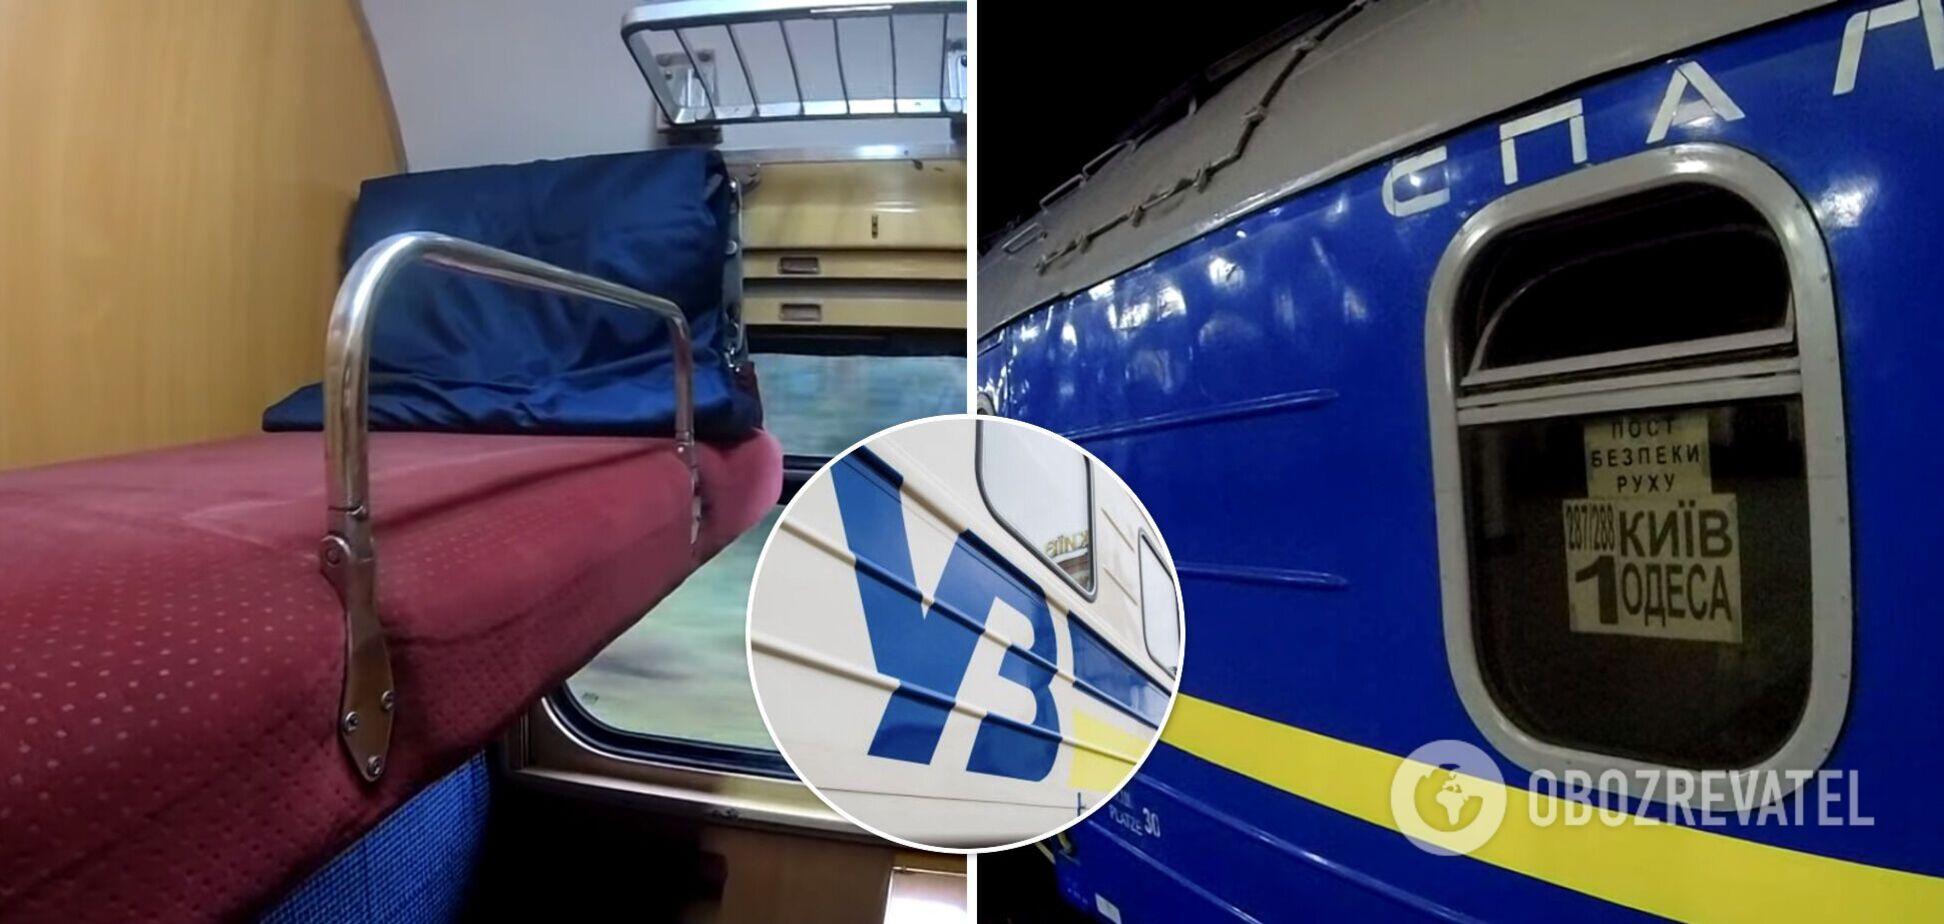 Поїзд з Києва до Одеси